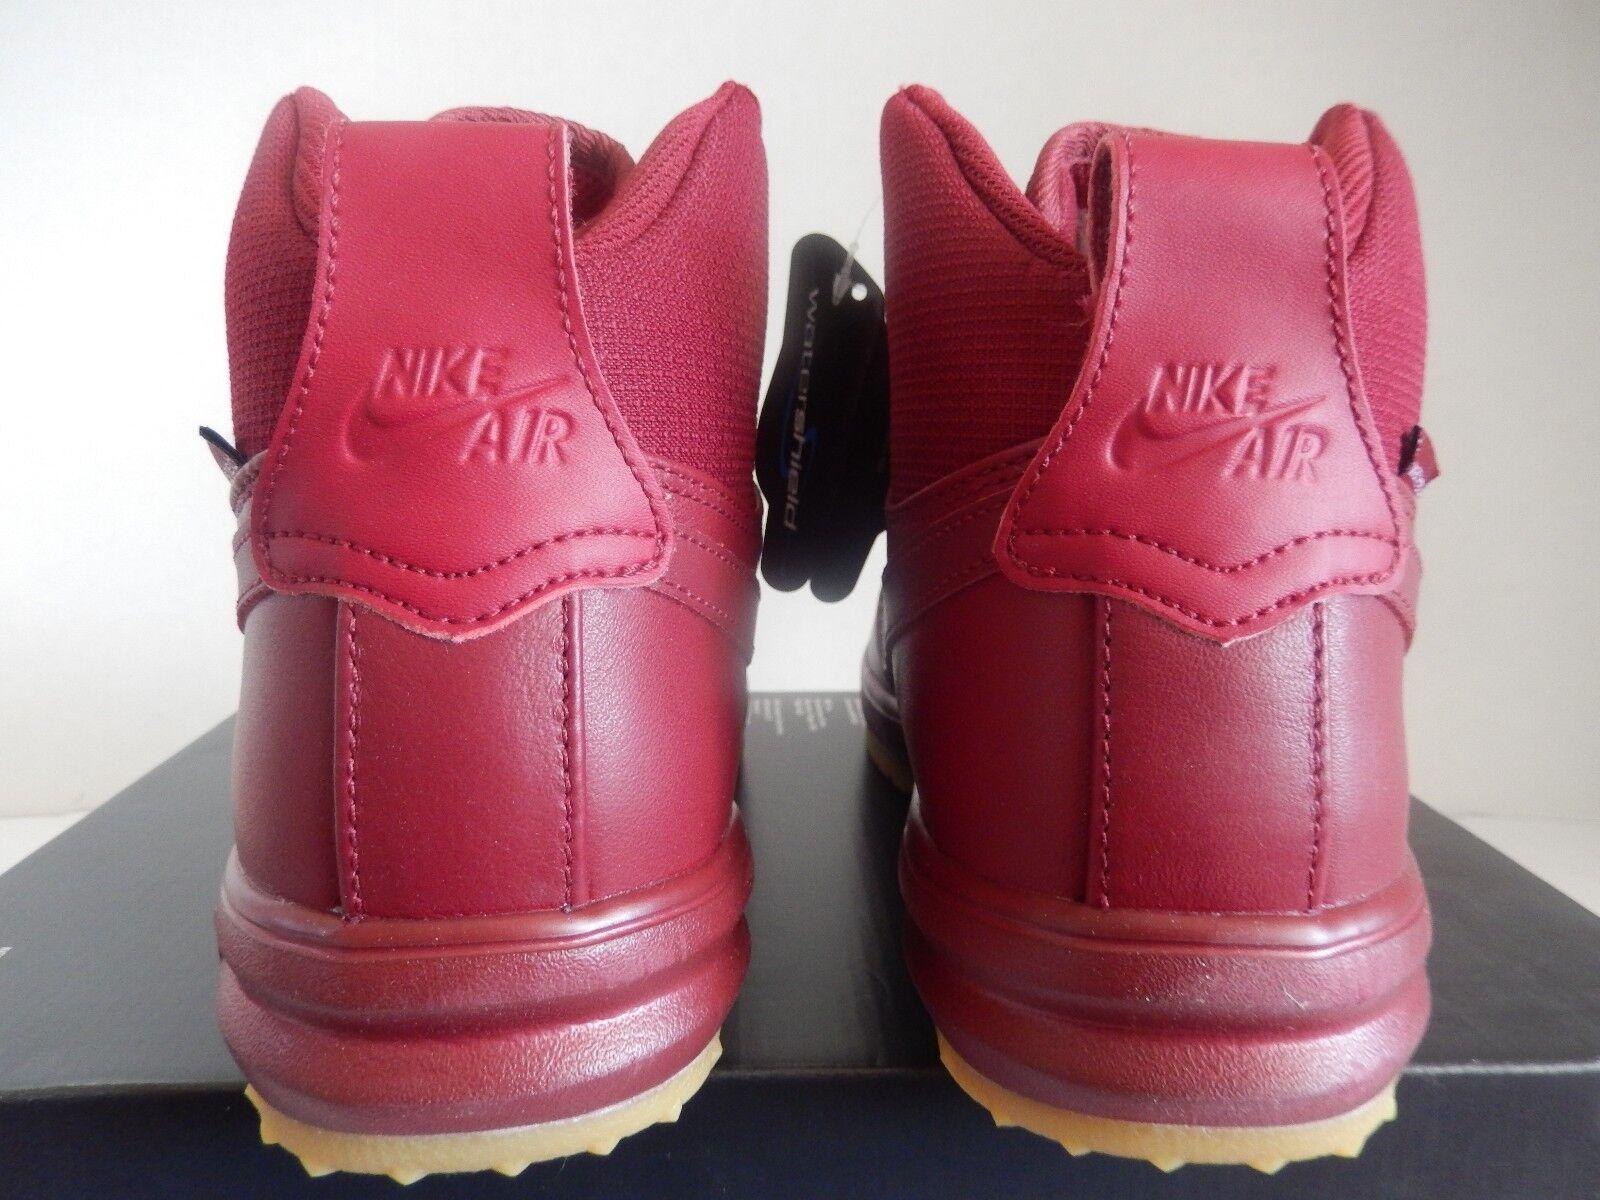 NIKE LUNAR FORCE 1 scarpe da ginnasticaavvio (GS) TEAM TEAM TEAM rosso SZ 5.5Y-donna SZ 7 [706803-600] 99111d